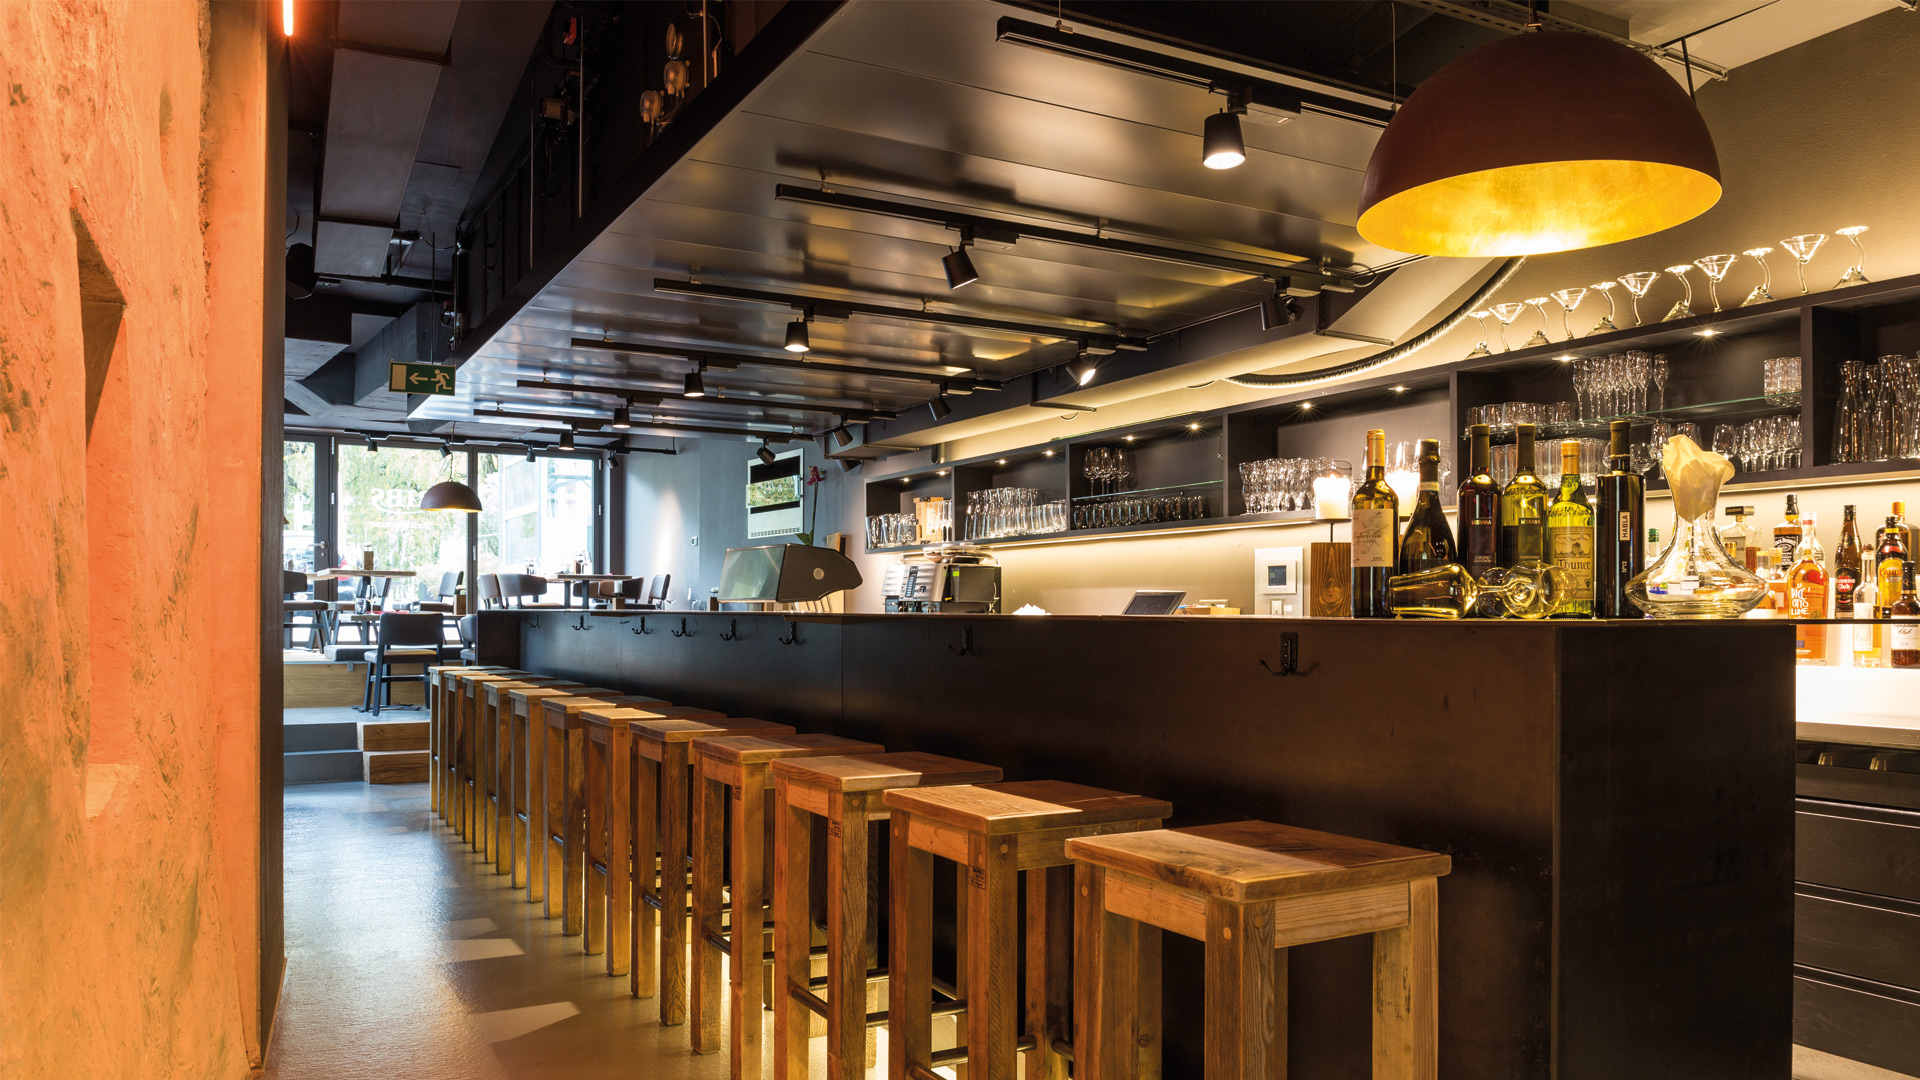 ribs-steakhouse-bar